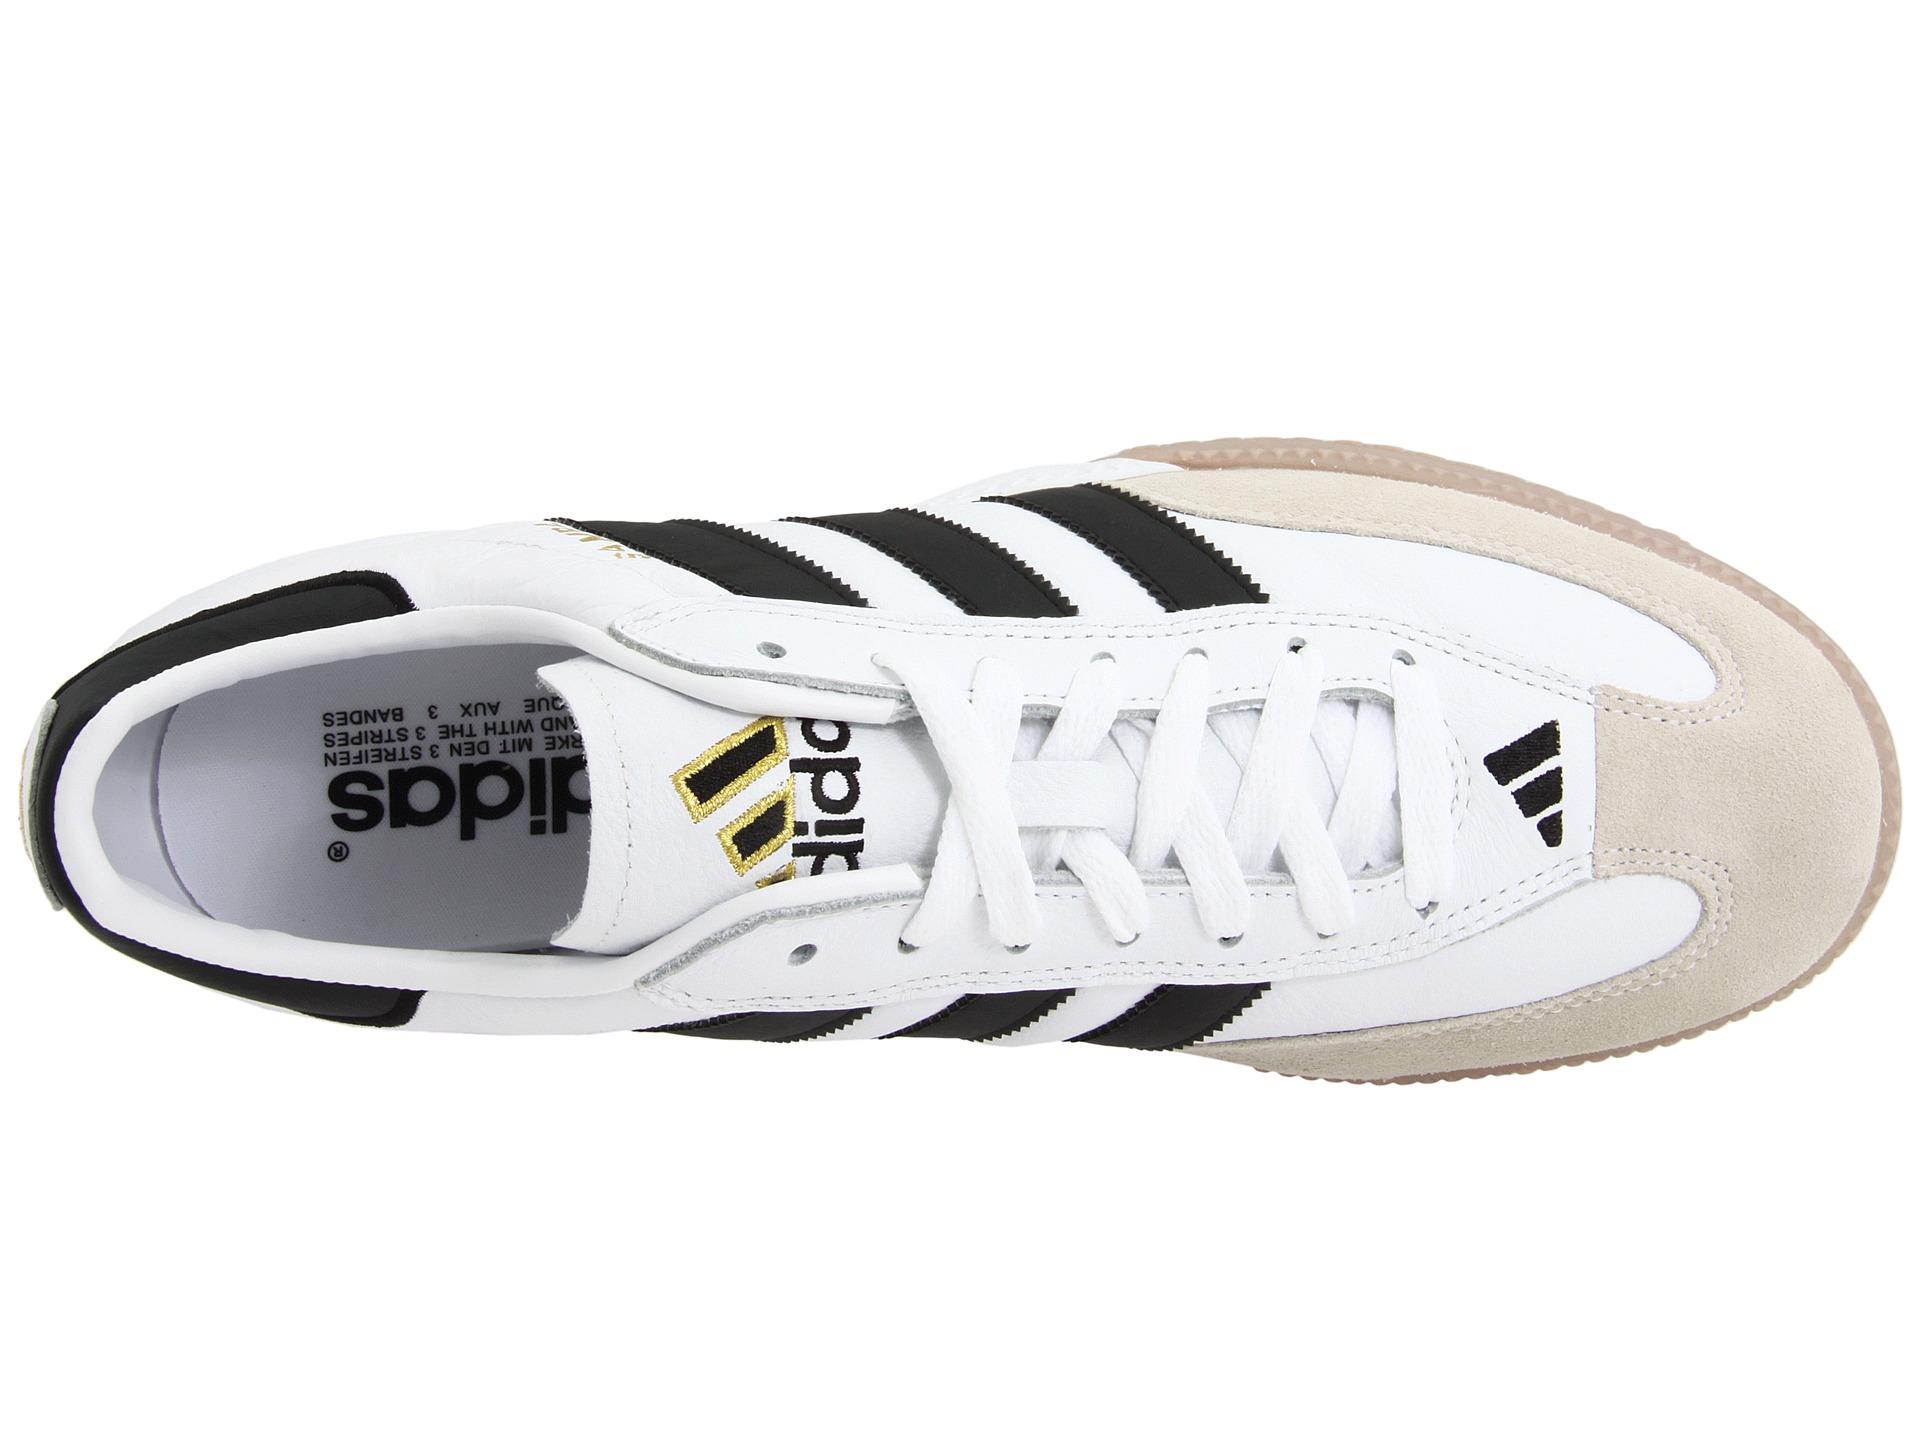 Adidas Samba Millenium Club Chelsea Shoes